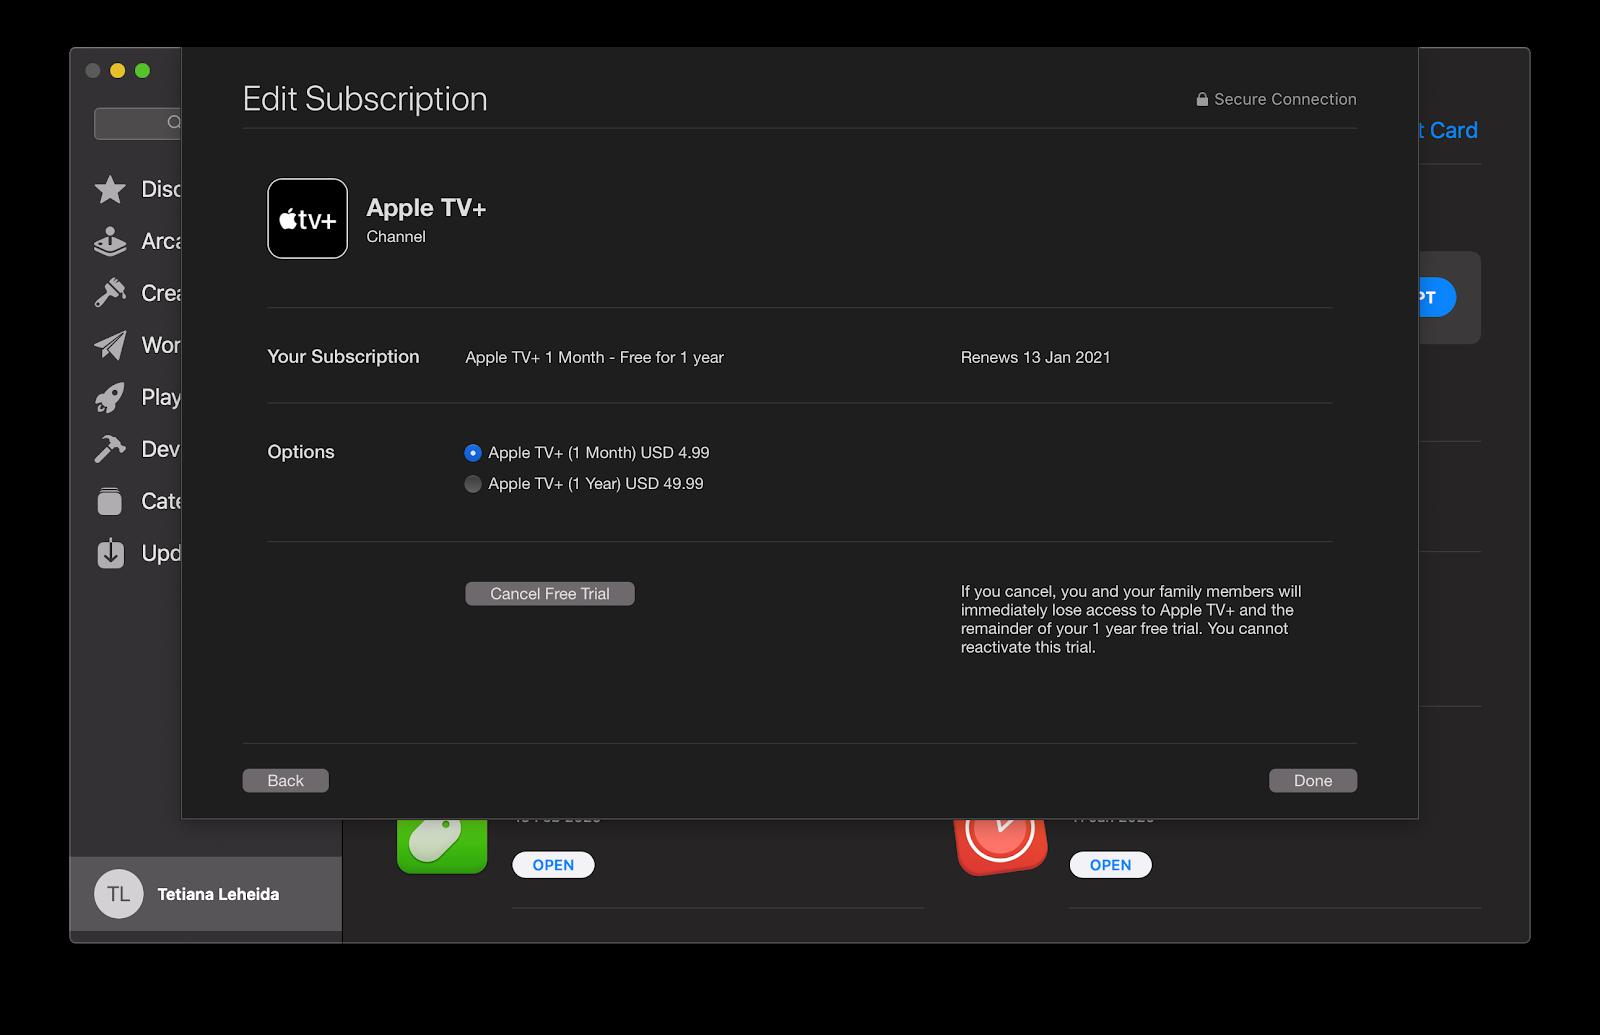 Apple TV+ subscription status